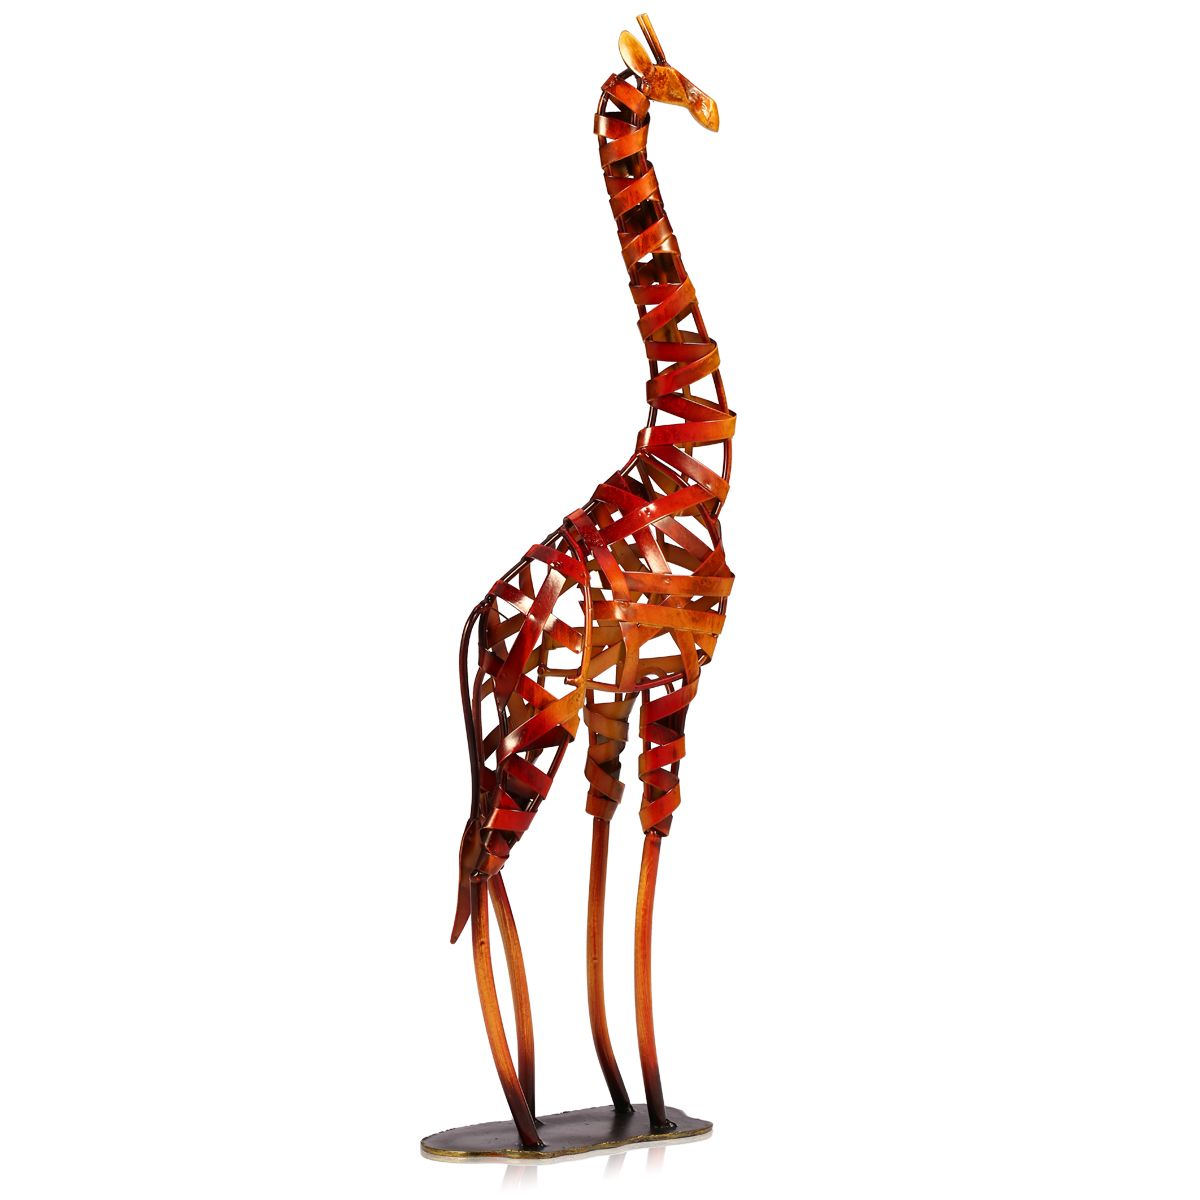 Tooarts Metal Sculpture Iron braided Giraffe Home Furnishing Articles Handicrafts Home Decoration